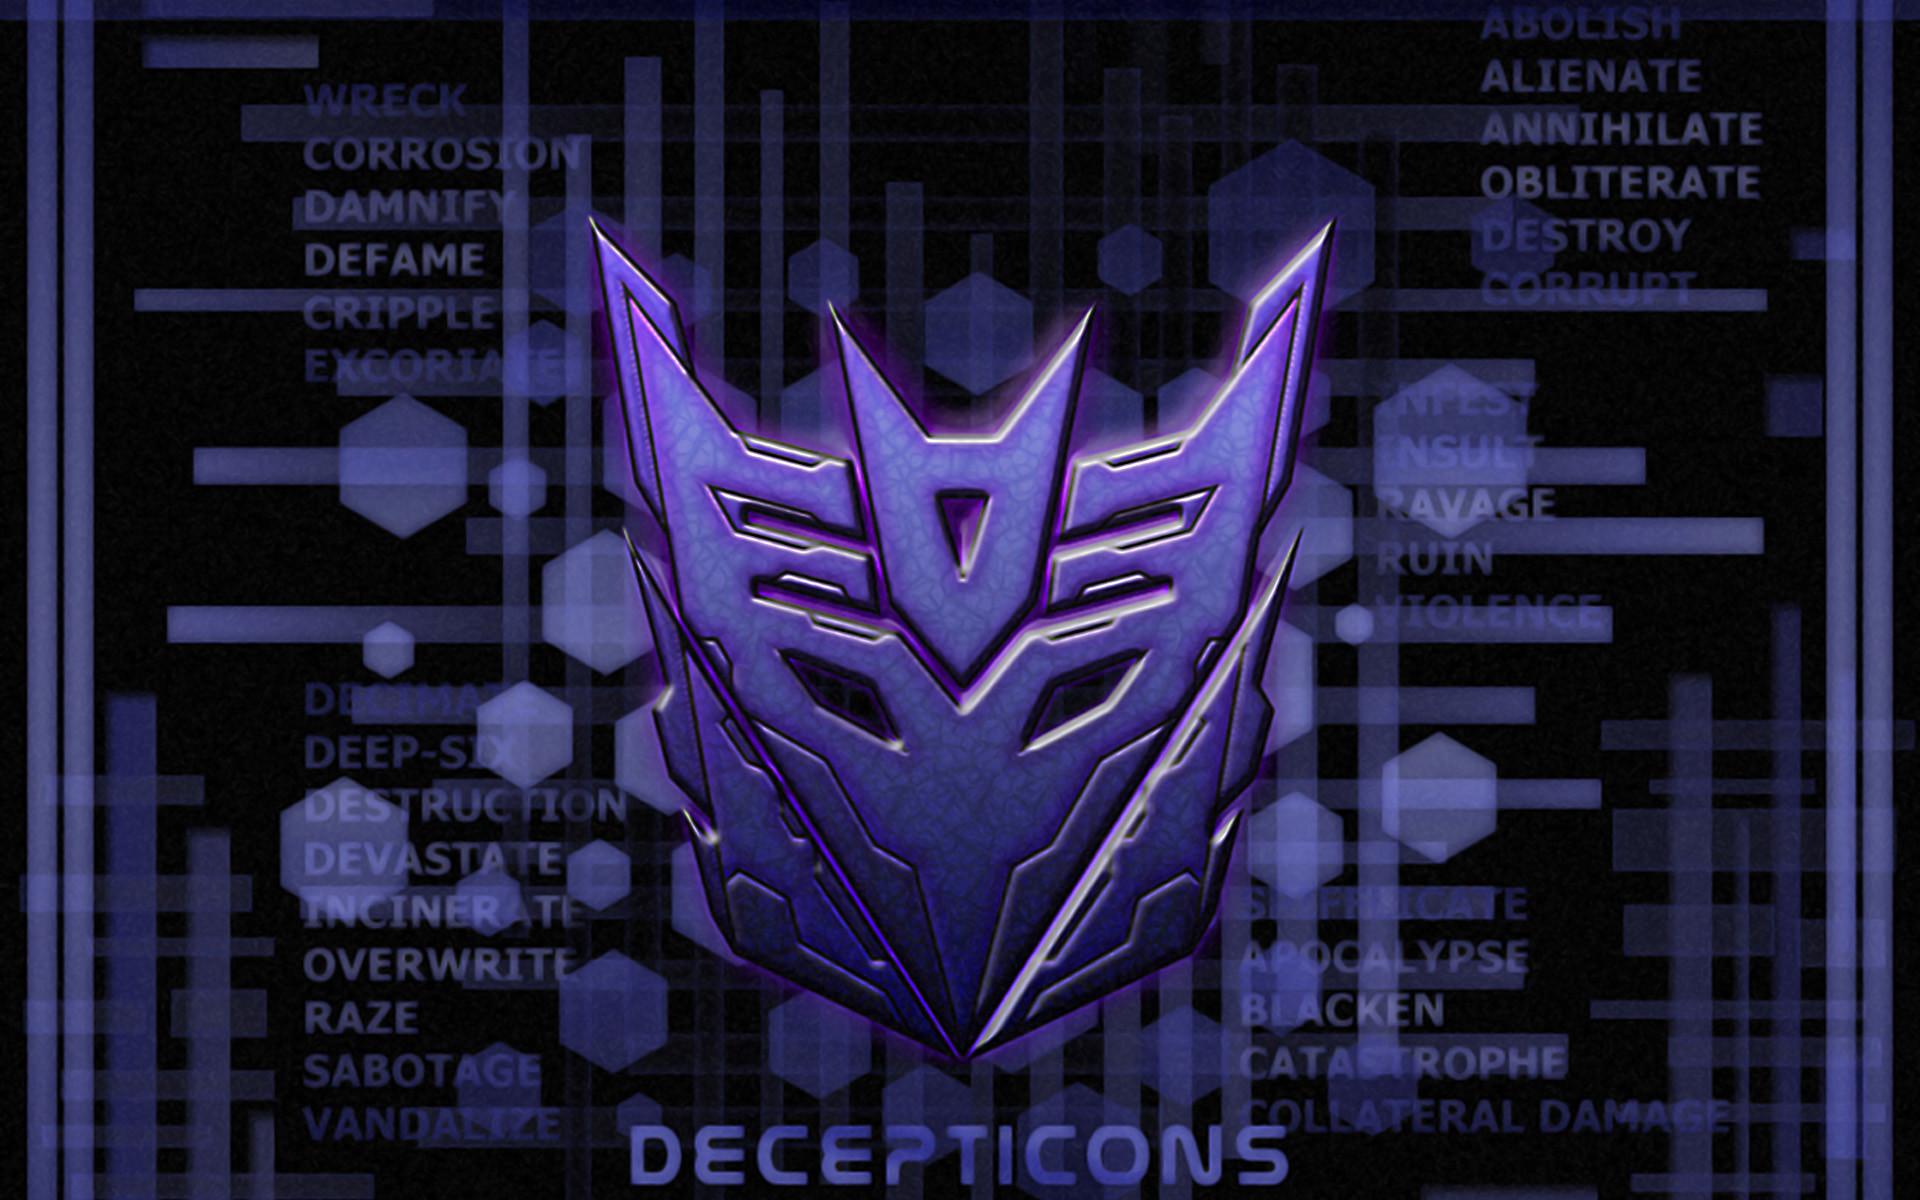 G1 Decepticons Wallpaper Gallery 6 (1920 x 1200 pixels) – Digital Citizen